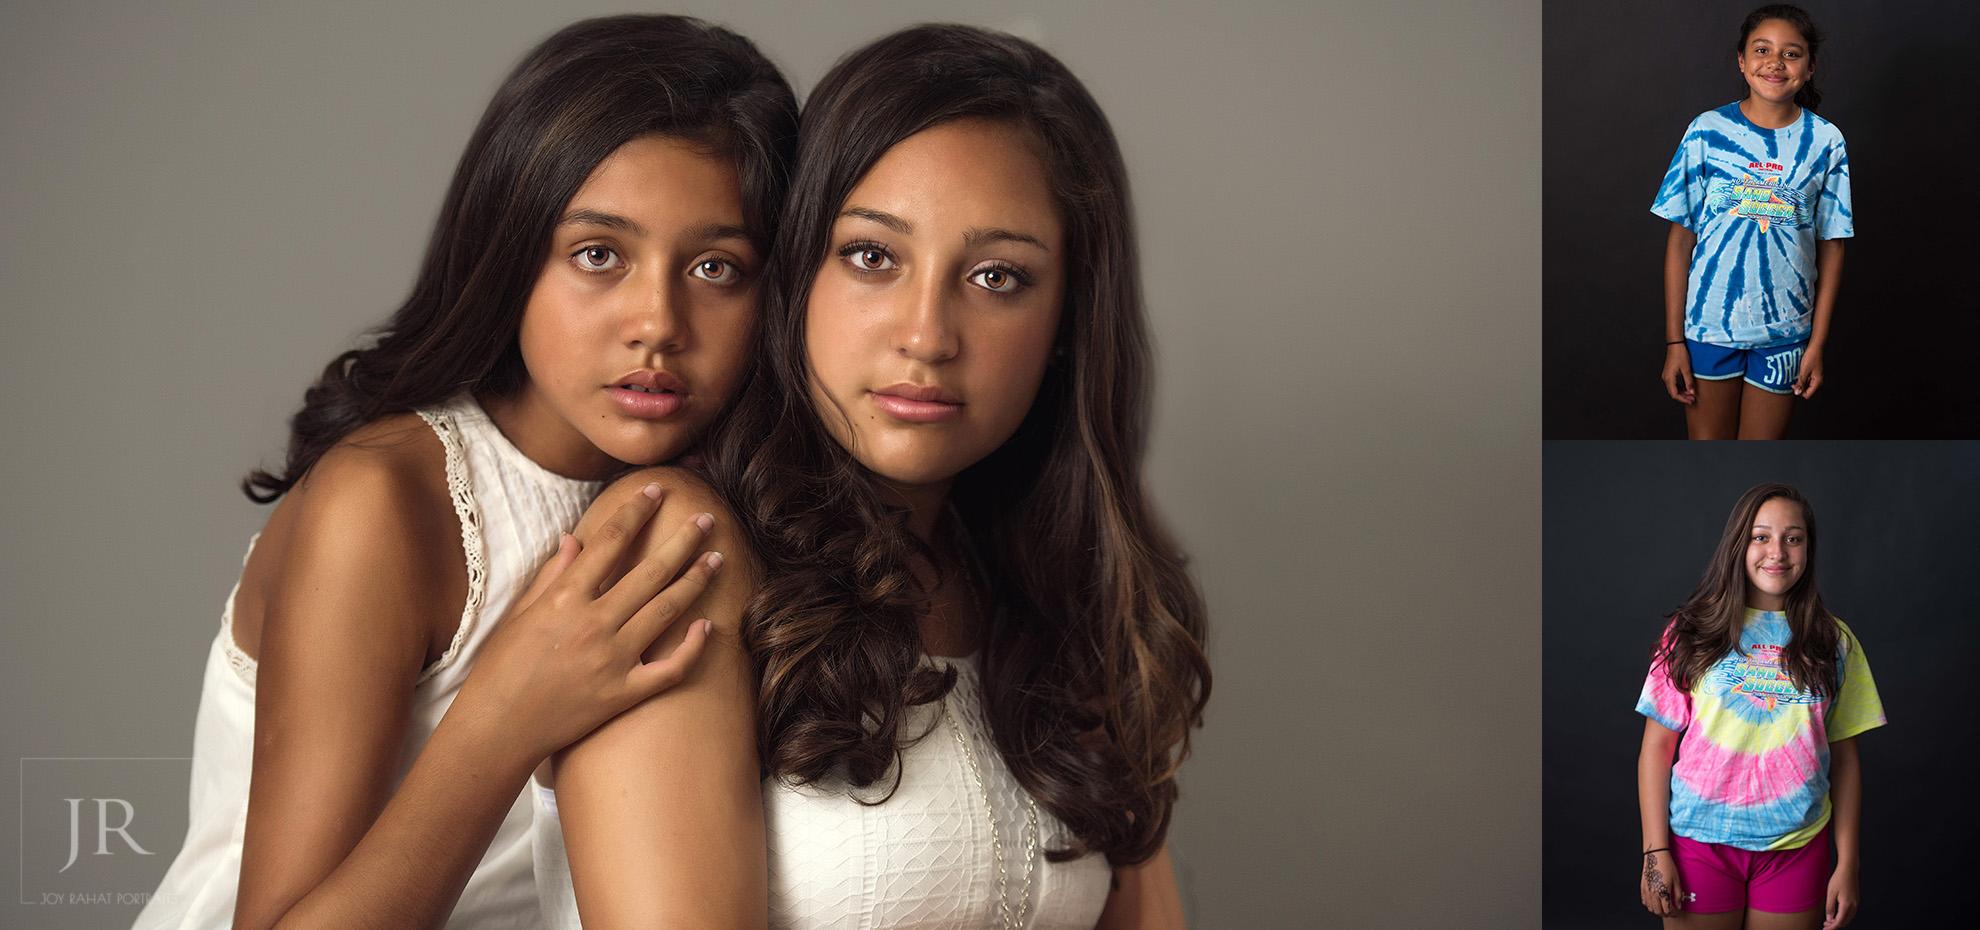 Sibling two latino sisters